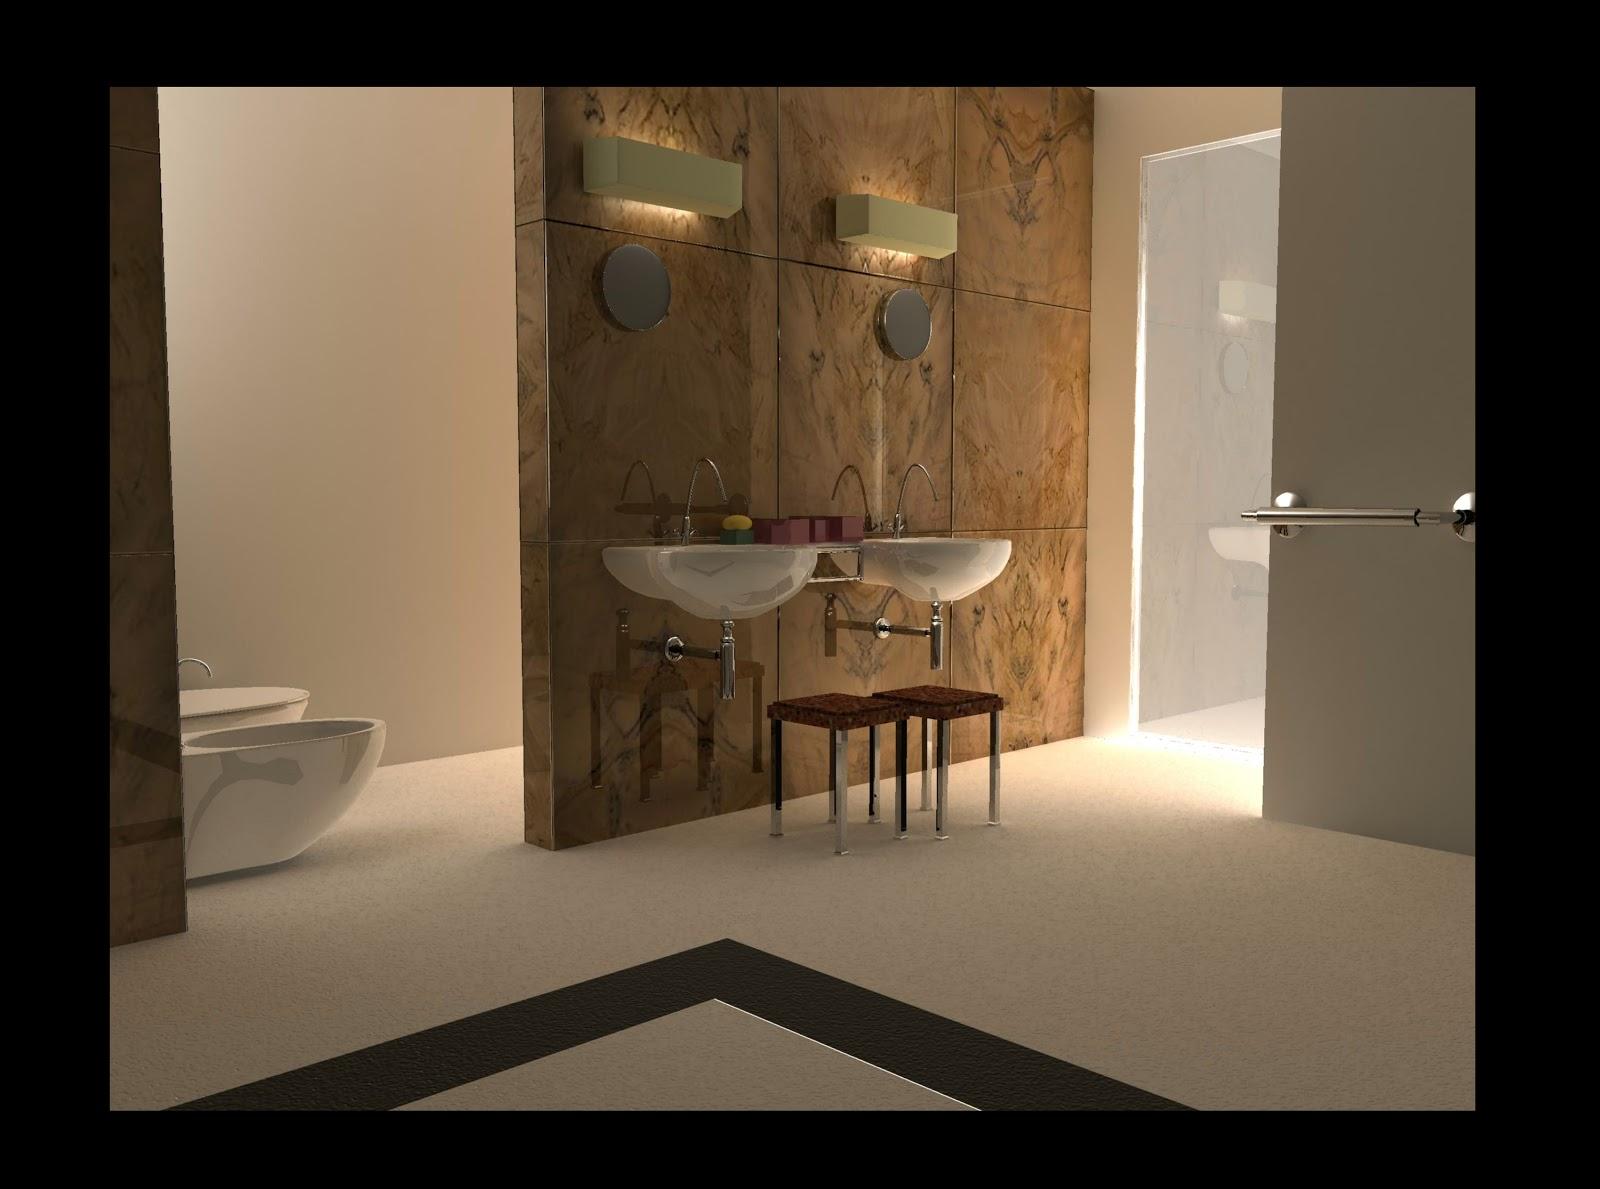 D artist creative graphic designer d visualizer bathroom